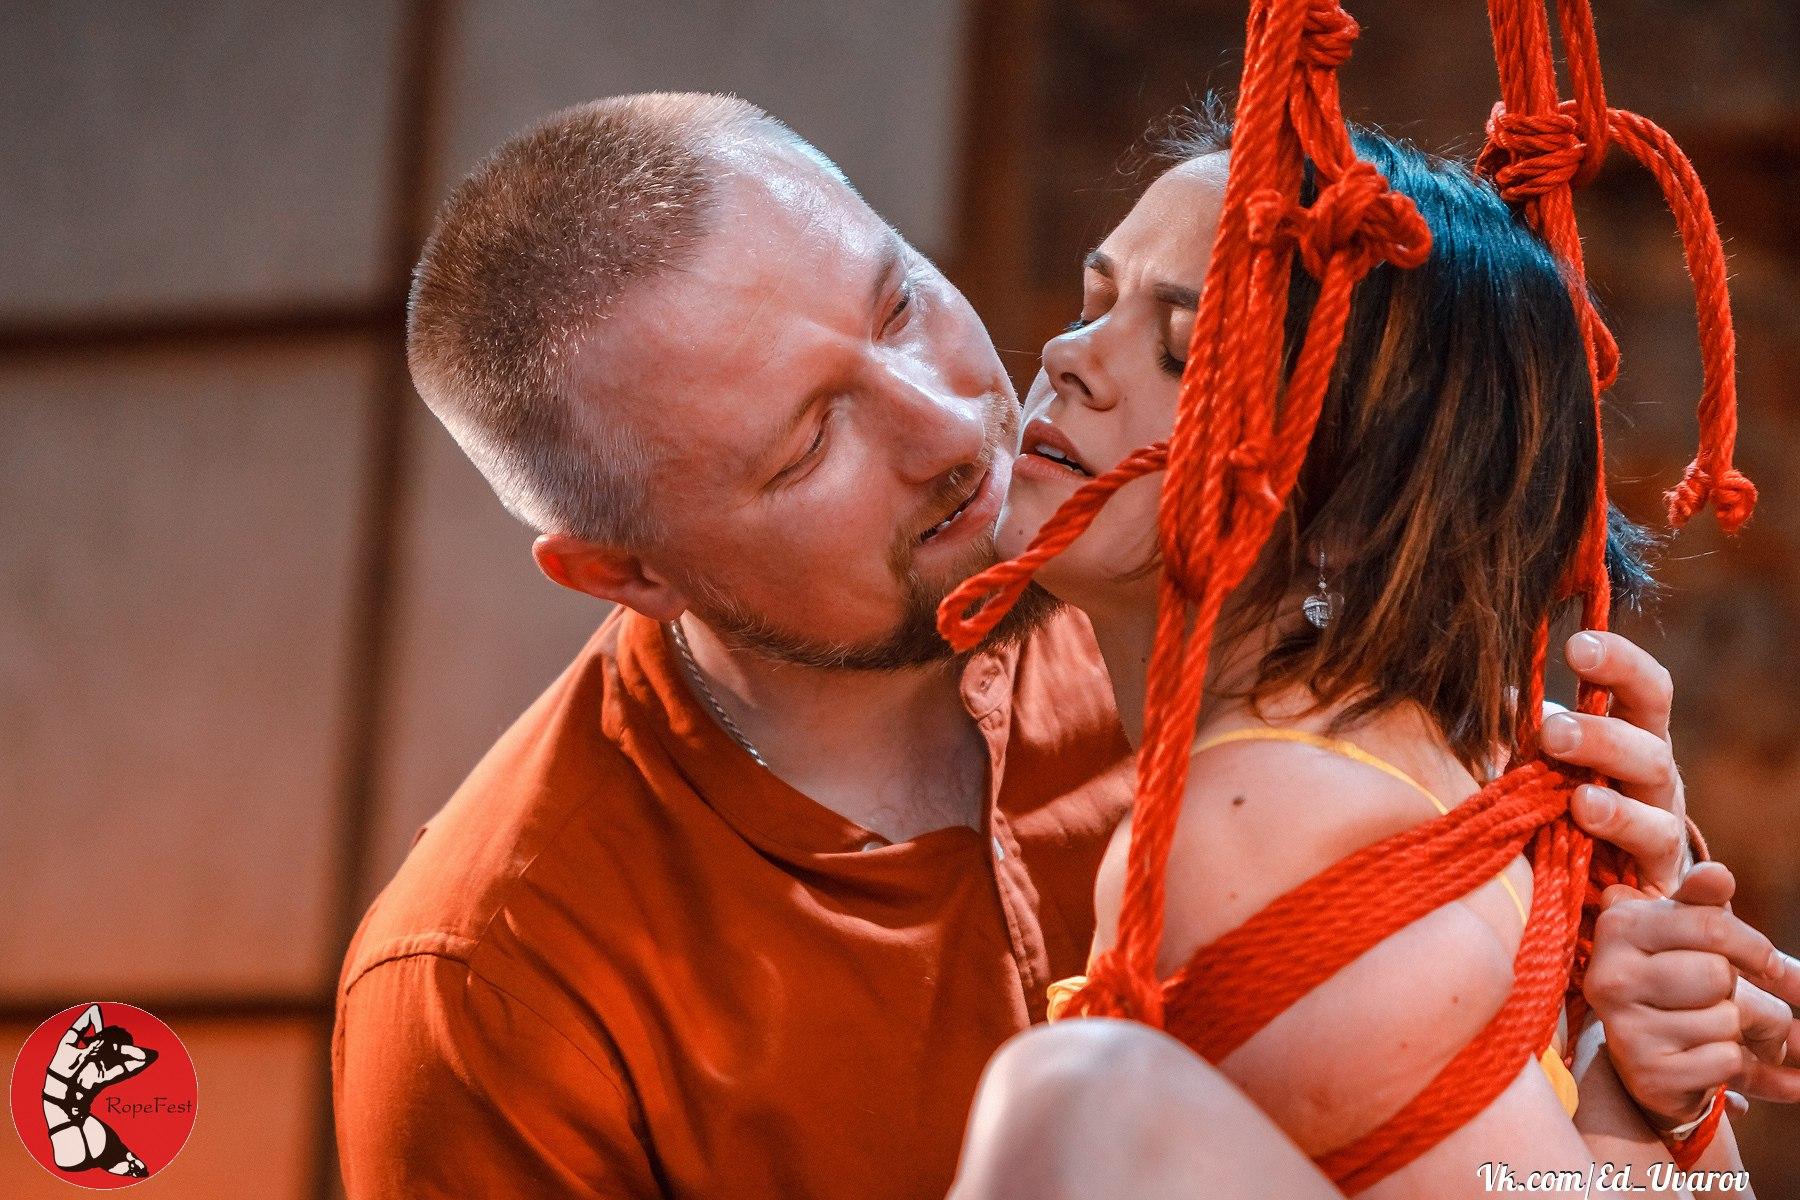 Rope Fest Peterburg  Velad. Photo by Ed Uvarov